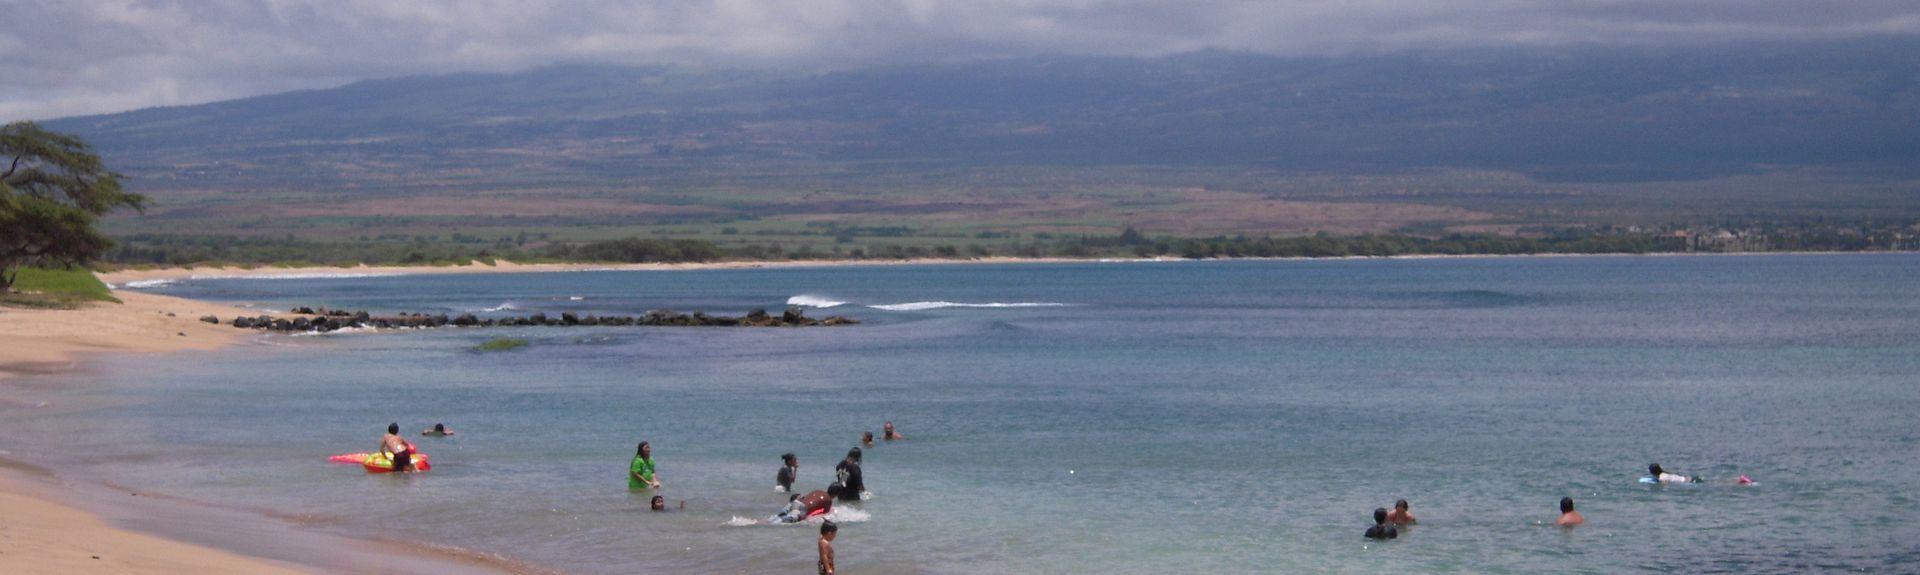 Central Maui, HI, USA